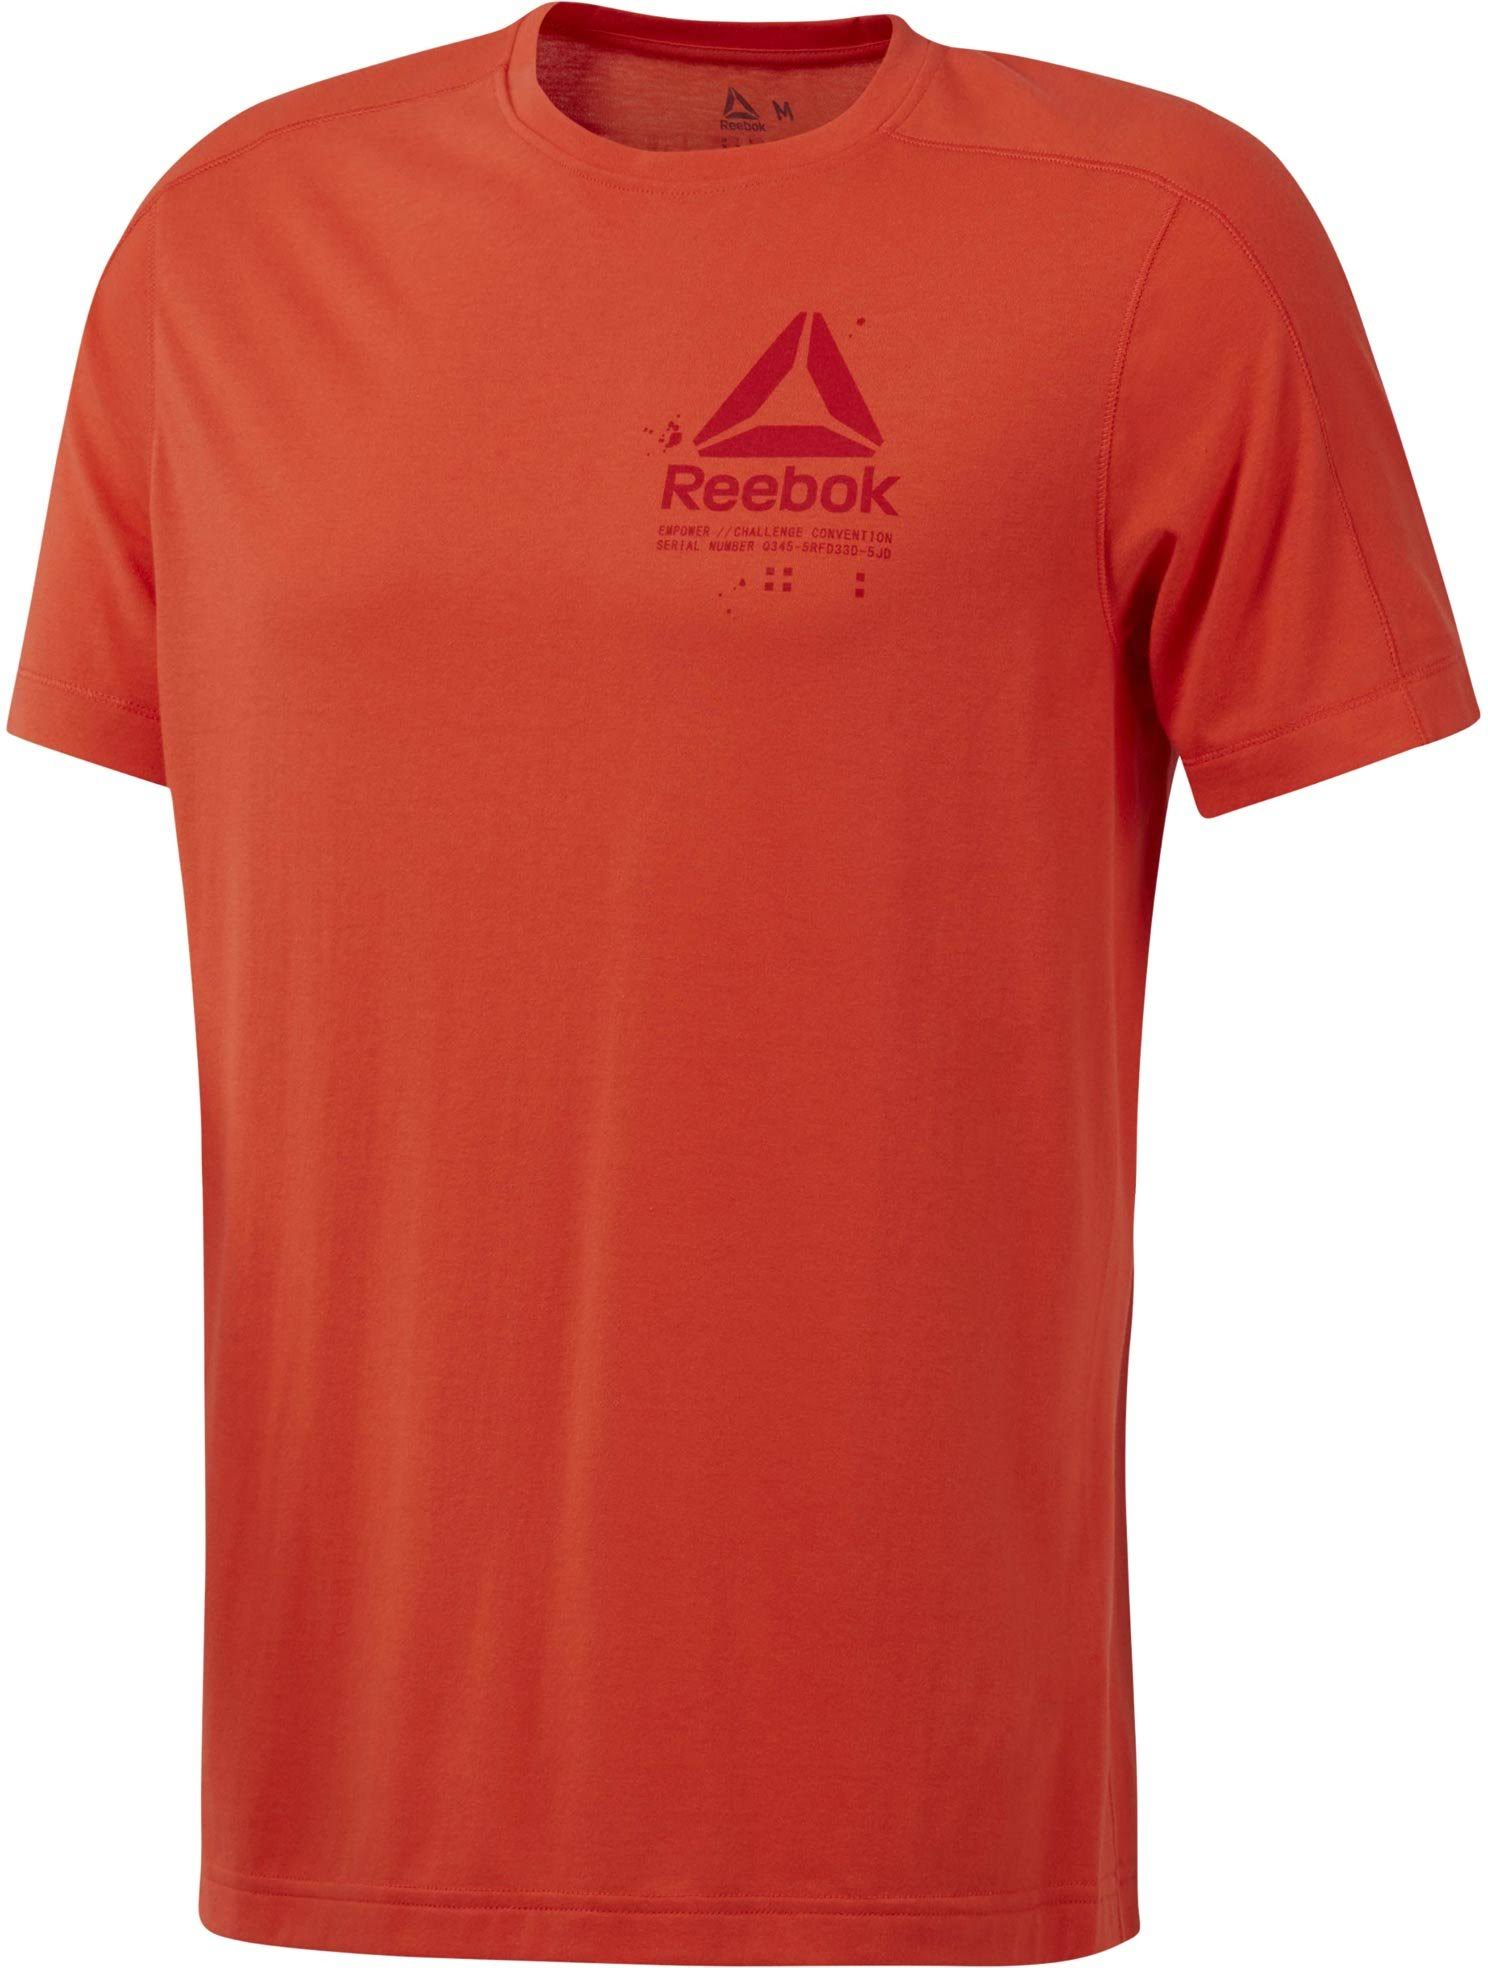 Sport S muzi Oranžová Graphic Trička Tee Krátkým Speedwick Rukávem Reebok PqSawx66